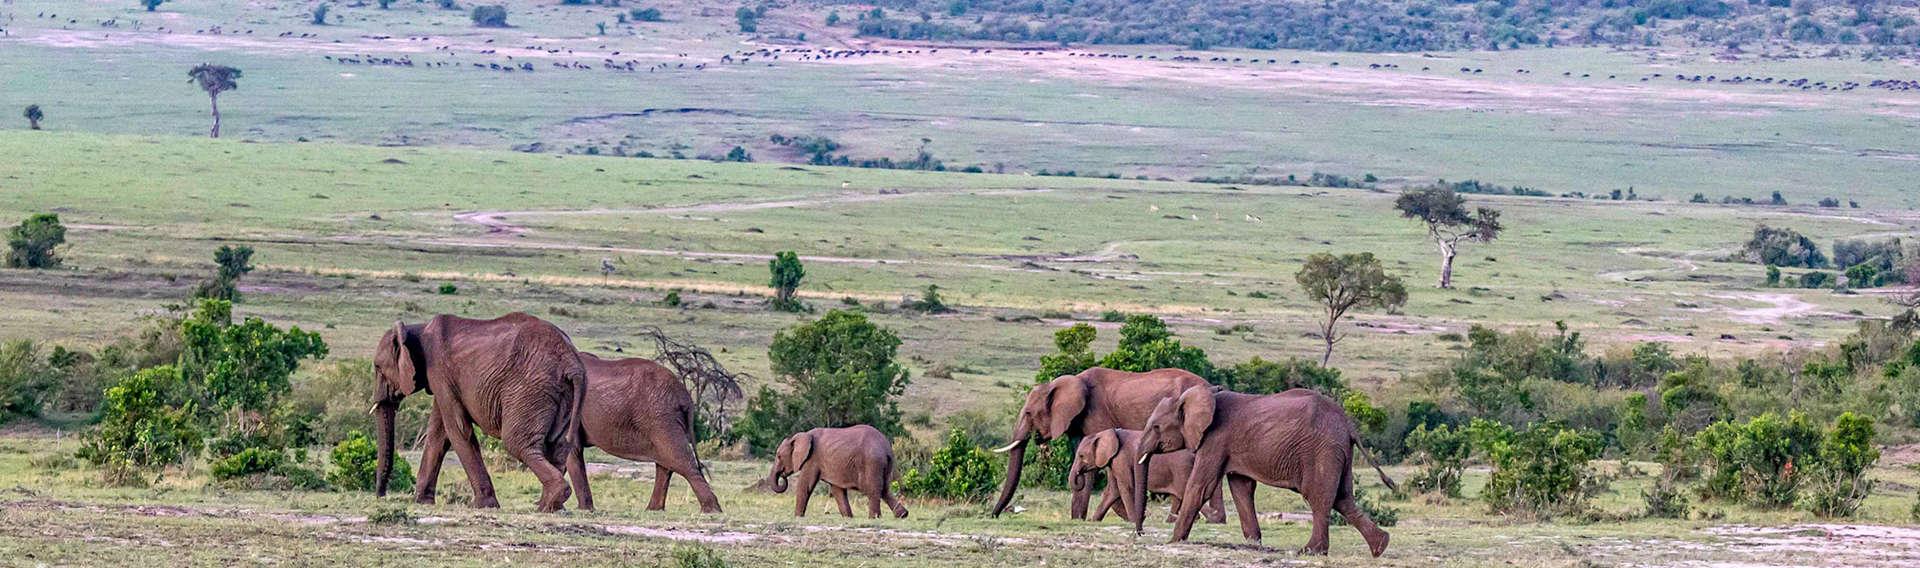 Tsavo West-Amboseli-Naivasha -Masai Mara-Kenya Budget Lodge safari